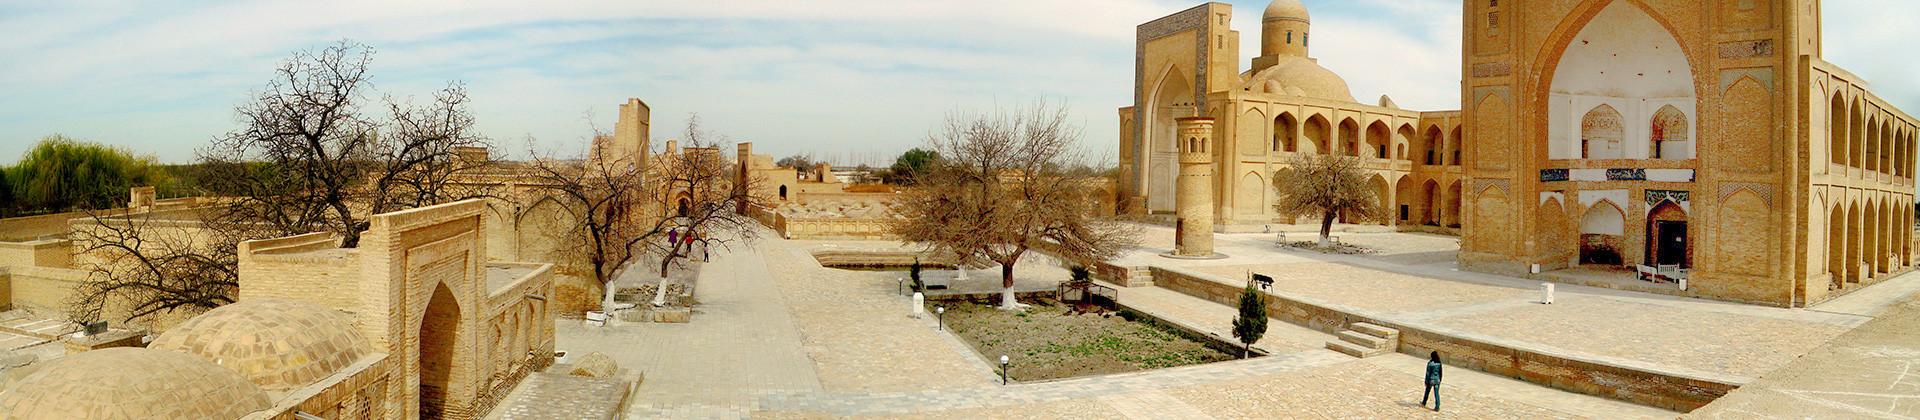 Classics of Uzbekistan - Tashkent, Khiva, Bukhara, Samarkand in 7 Days (Comfort) - 1